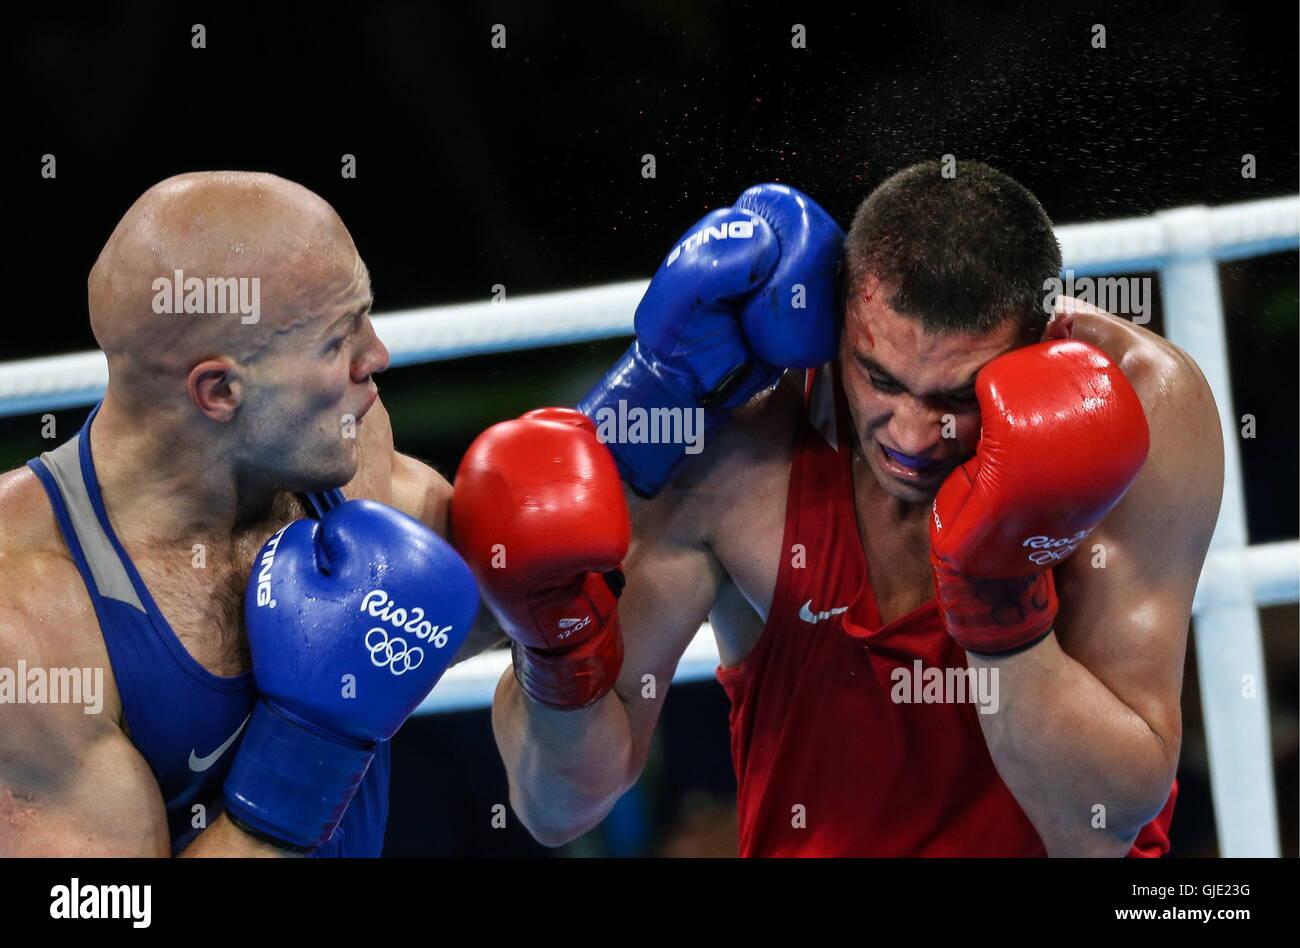 Río de Janeiro, Brasil. 15 Aug, 2016. Vassiliy Levit (L) de Kazajstán y Yevgeny Tishchenko de Rusia lucha Imagen De Stock